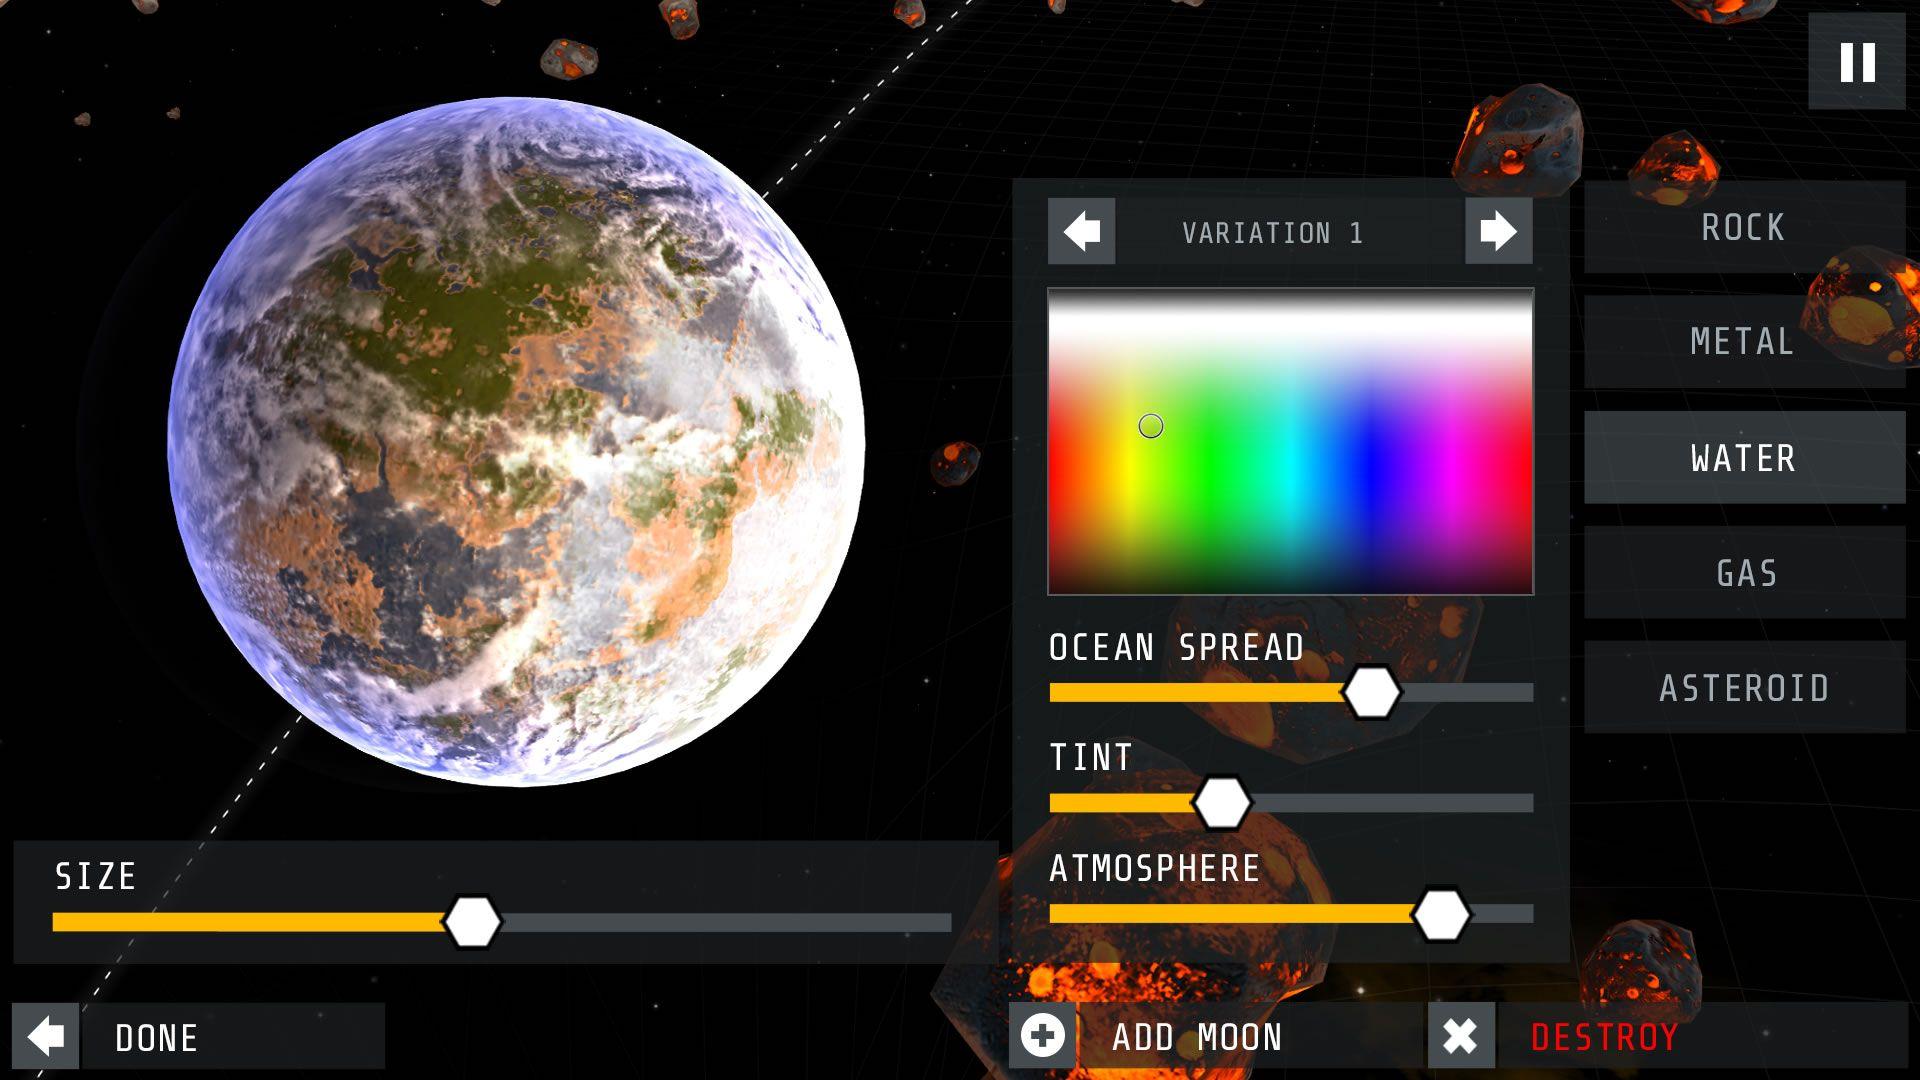 Interstellar App Images Showcase The Movie 39 S Mobile Game